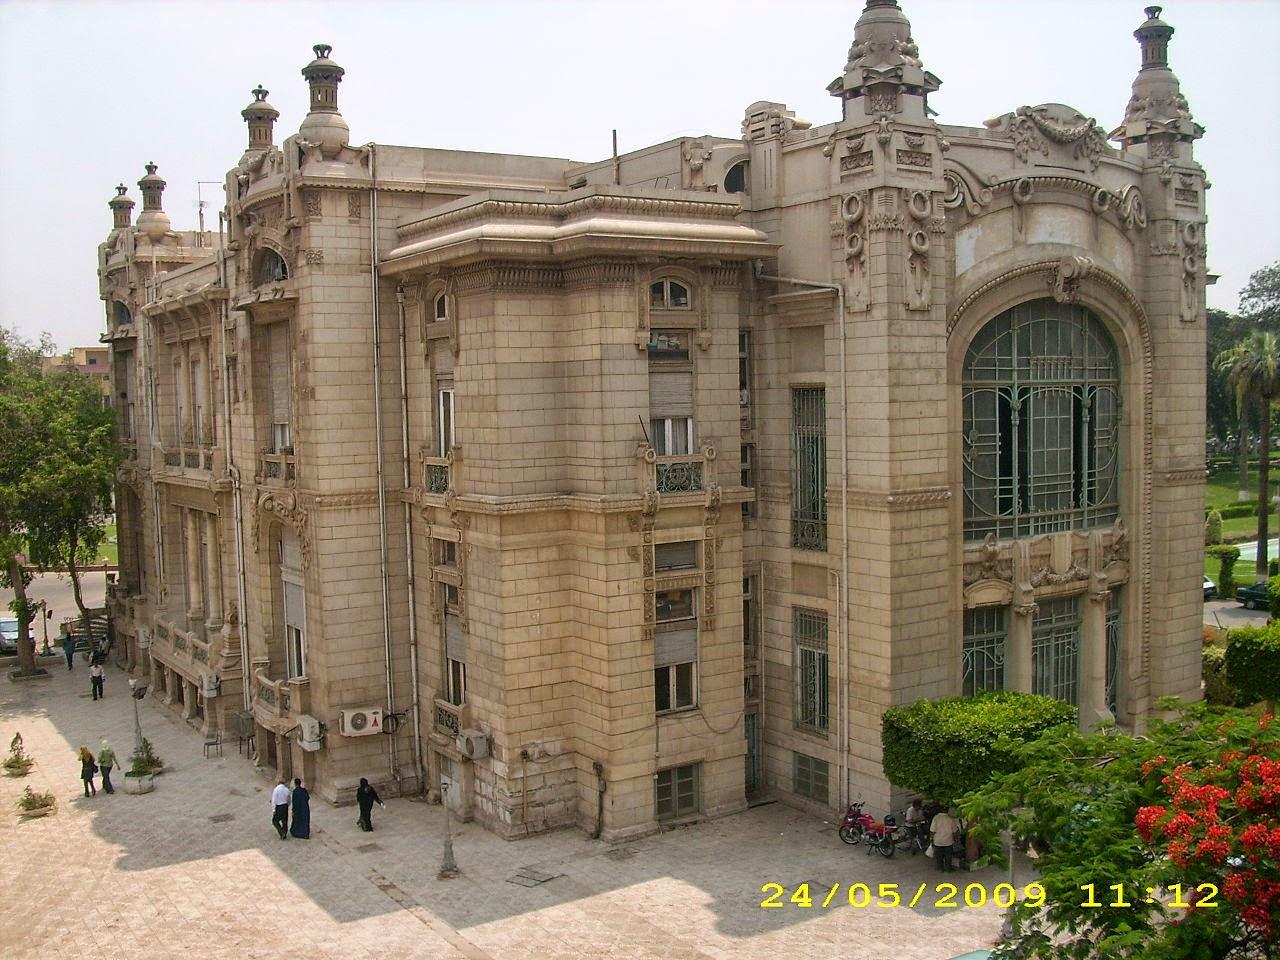 1280px-Ain_Shams_University-Zafarana_Palace2.jpg